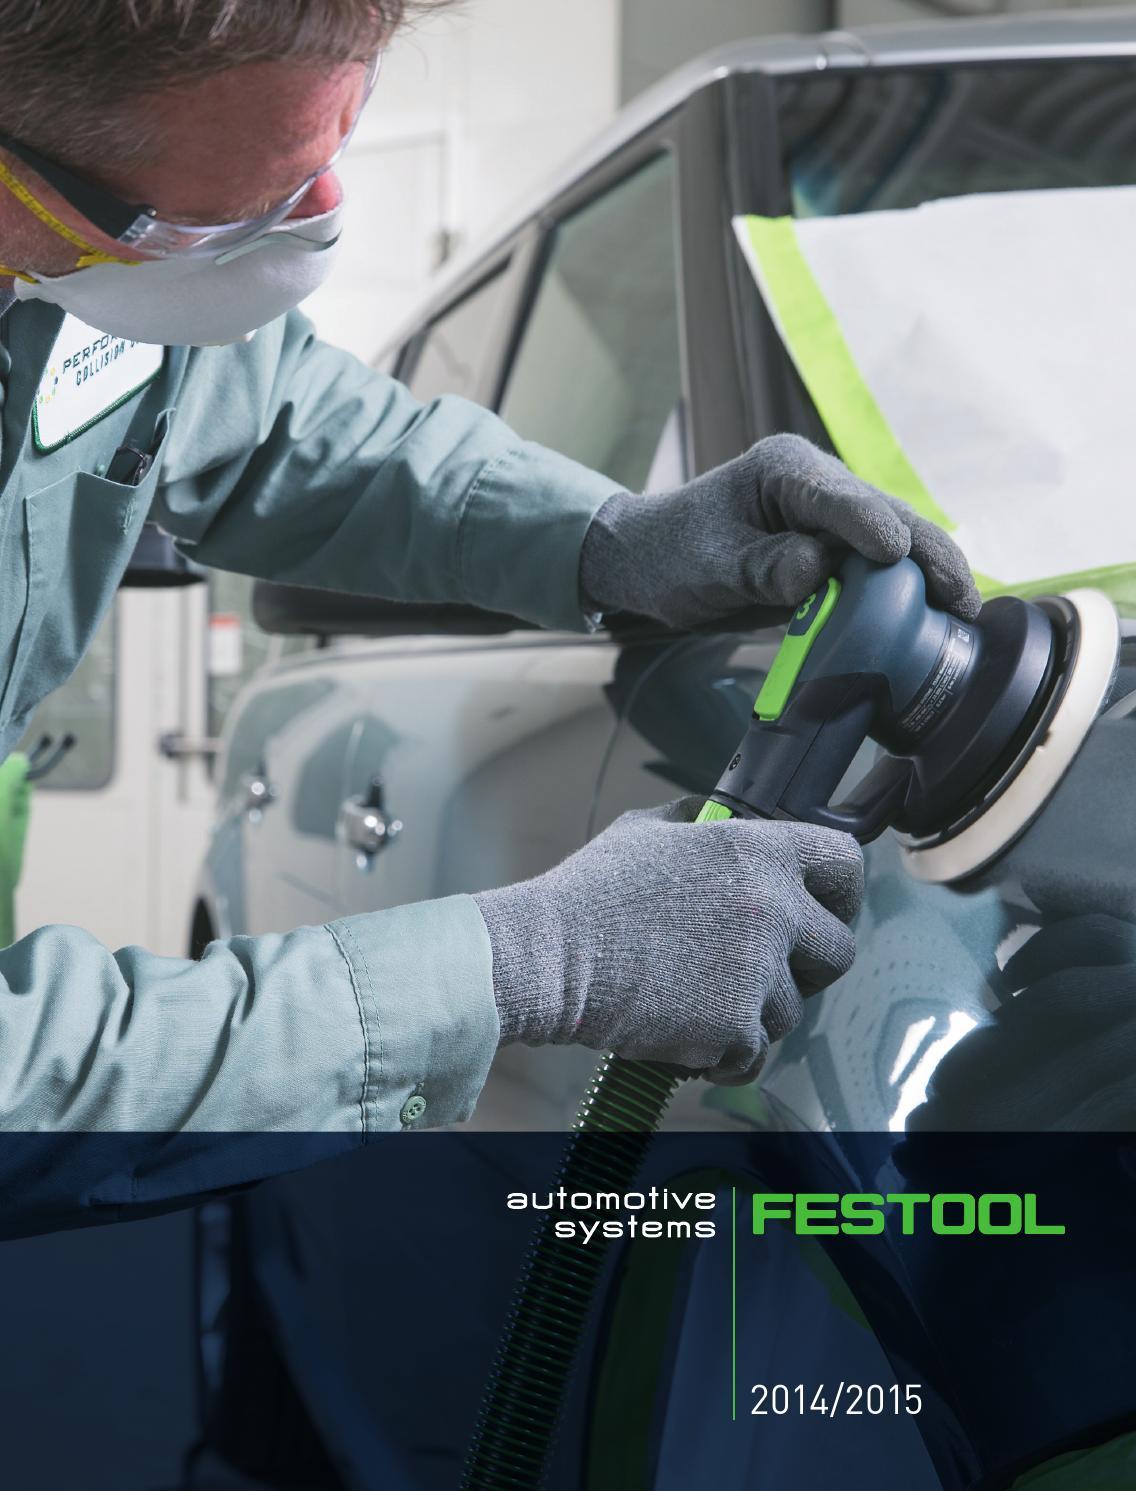 Festool 498323 D90 S1000 Grit Platin 2 Abrasive Pad for Electric Sanders 15 pk